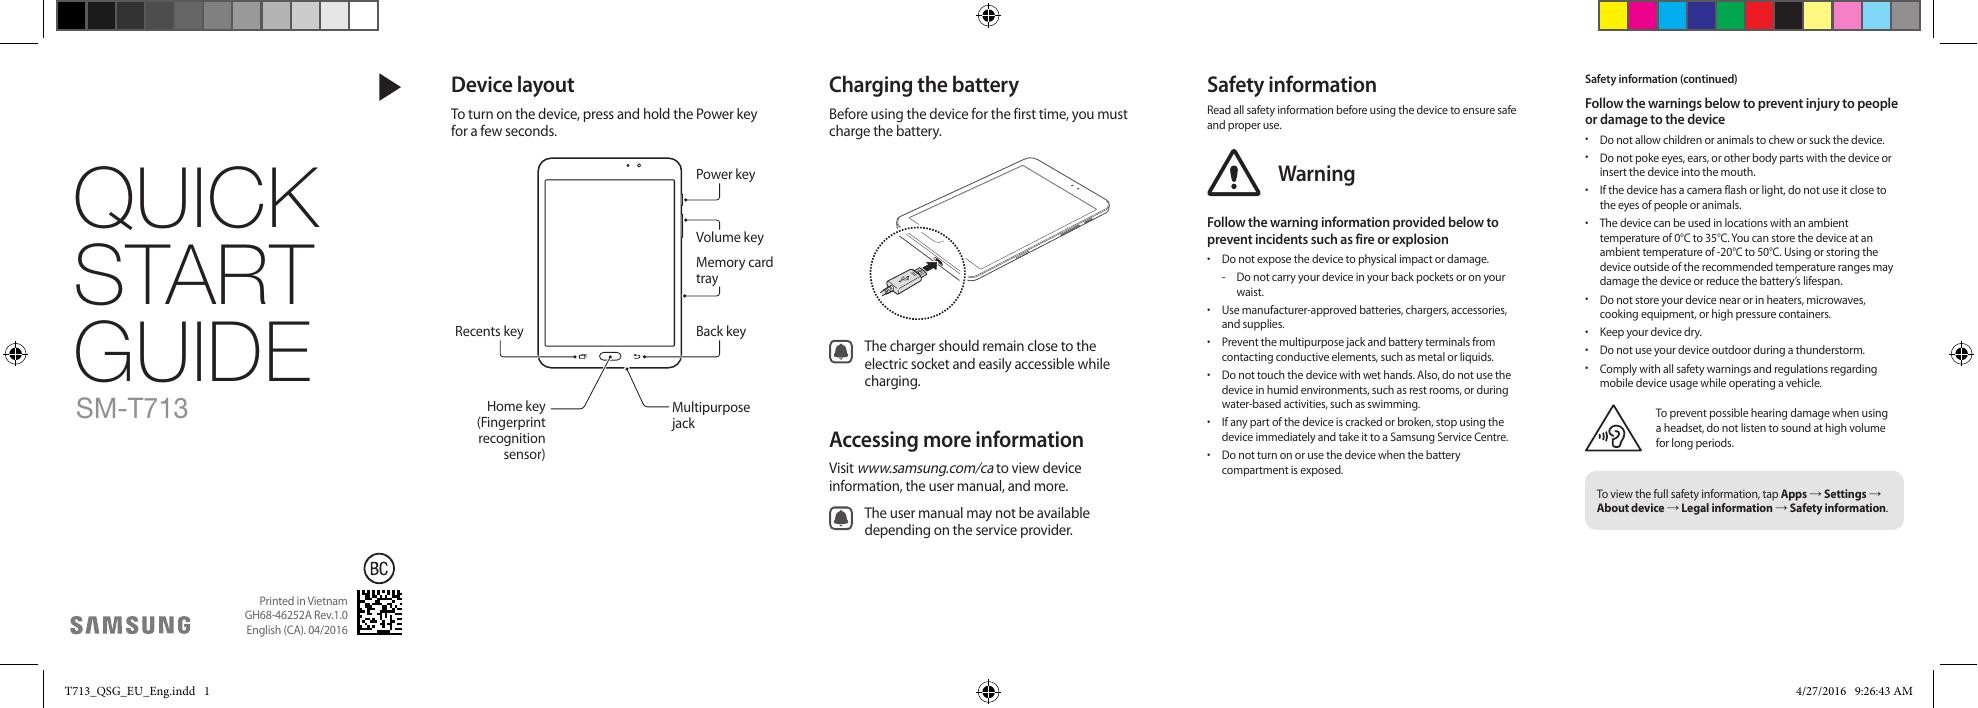 Samsung Galaxy Tab S2 (8 0) Quick Start Guide | manualzz com